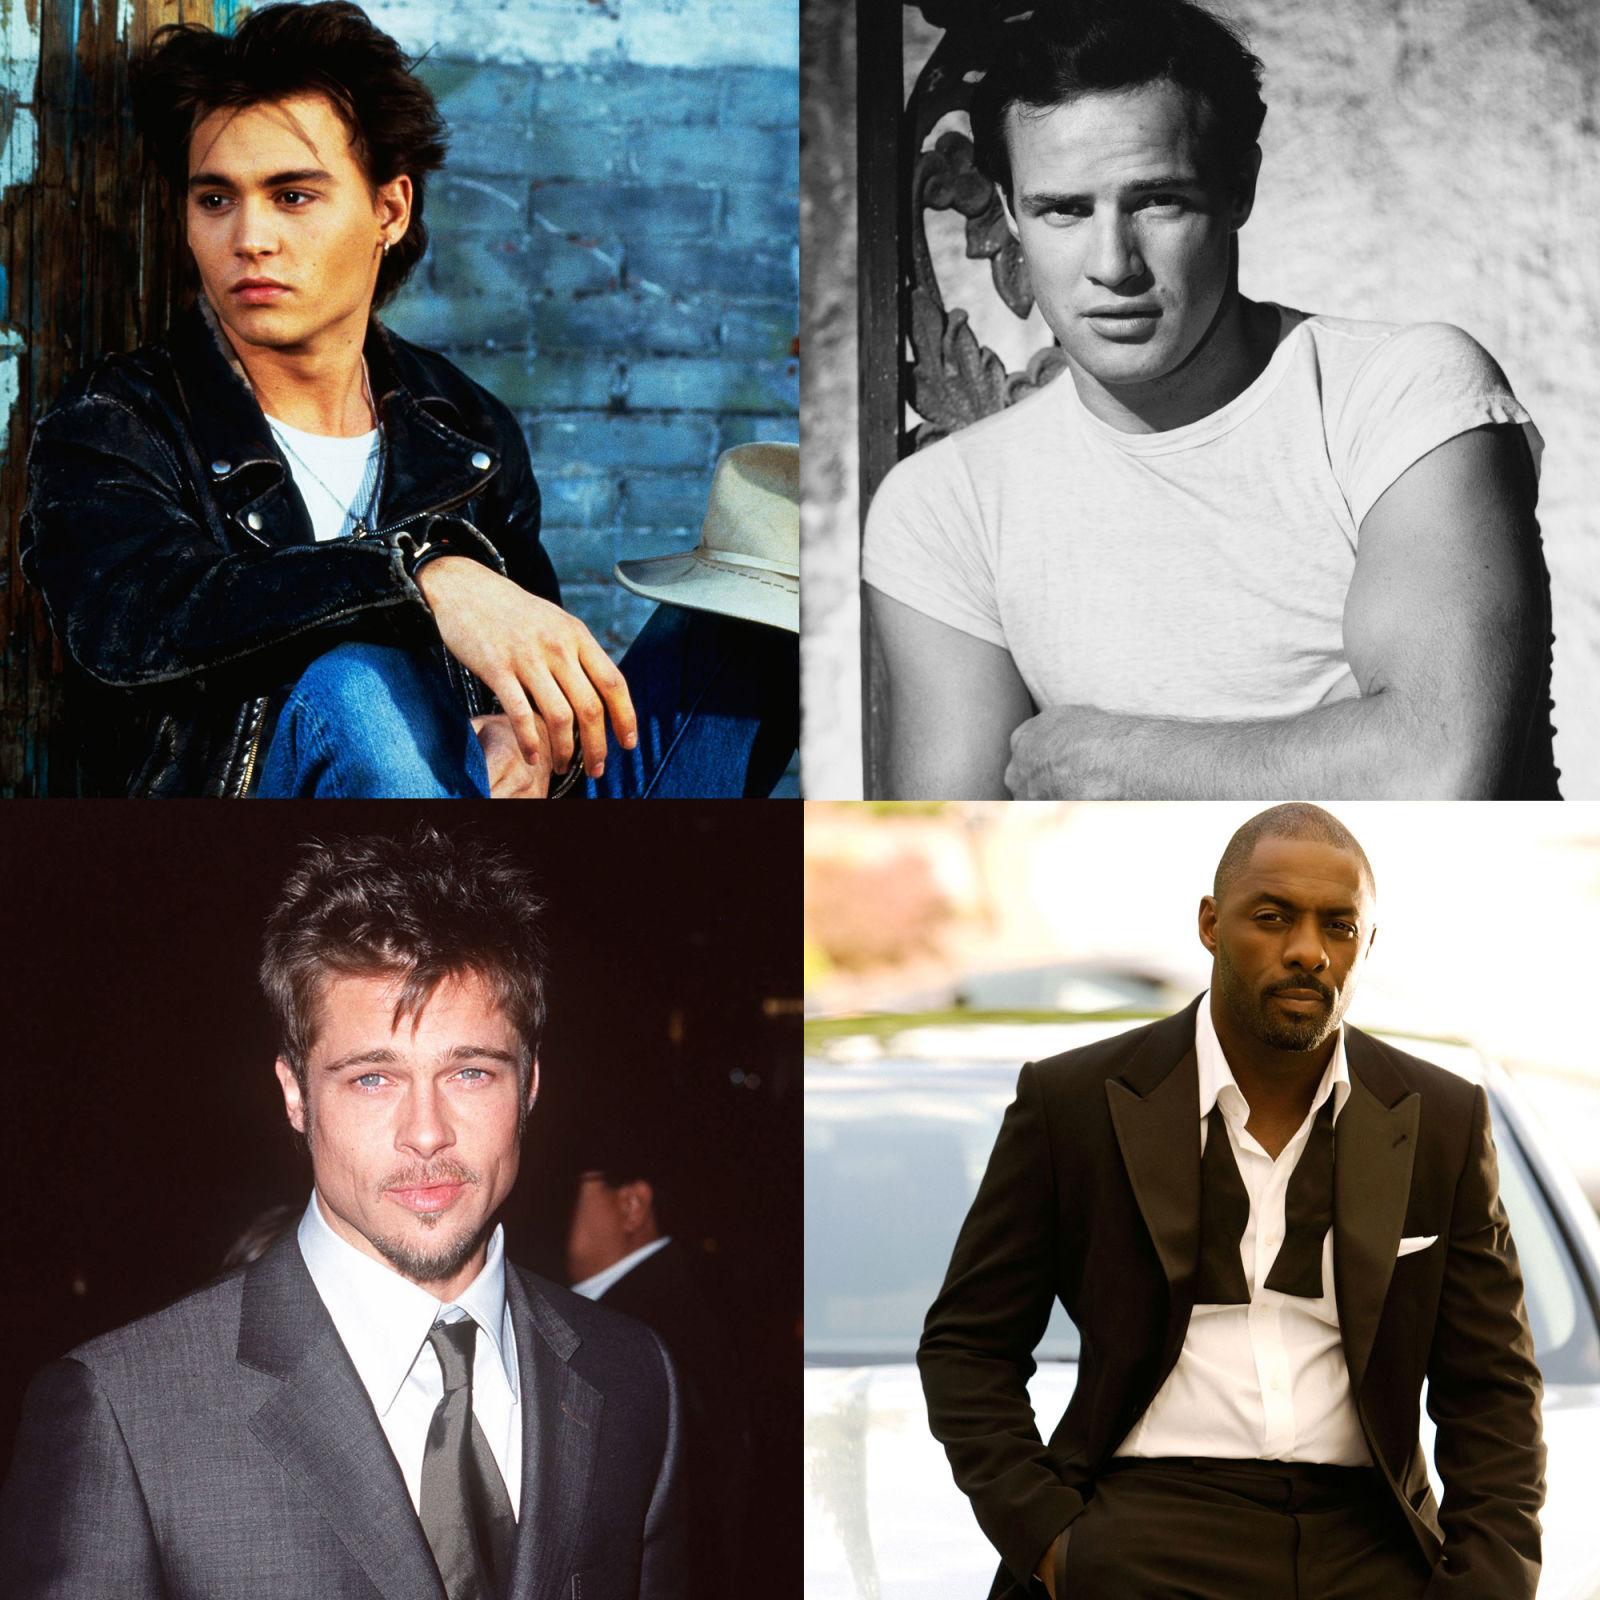 Ugliest Male Celebrities - Top Ten List - TheTopTens®